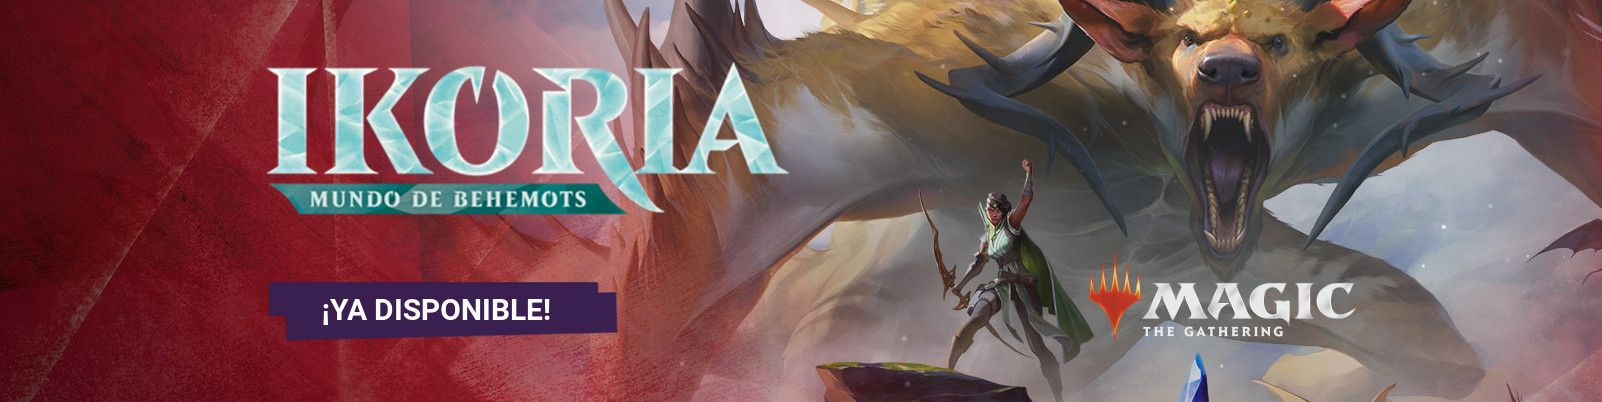 MTG Ikoria Mundo de Behemots - Banner 2